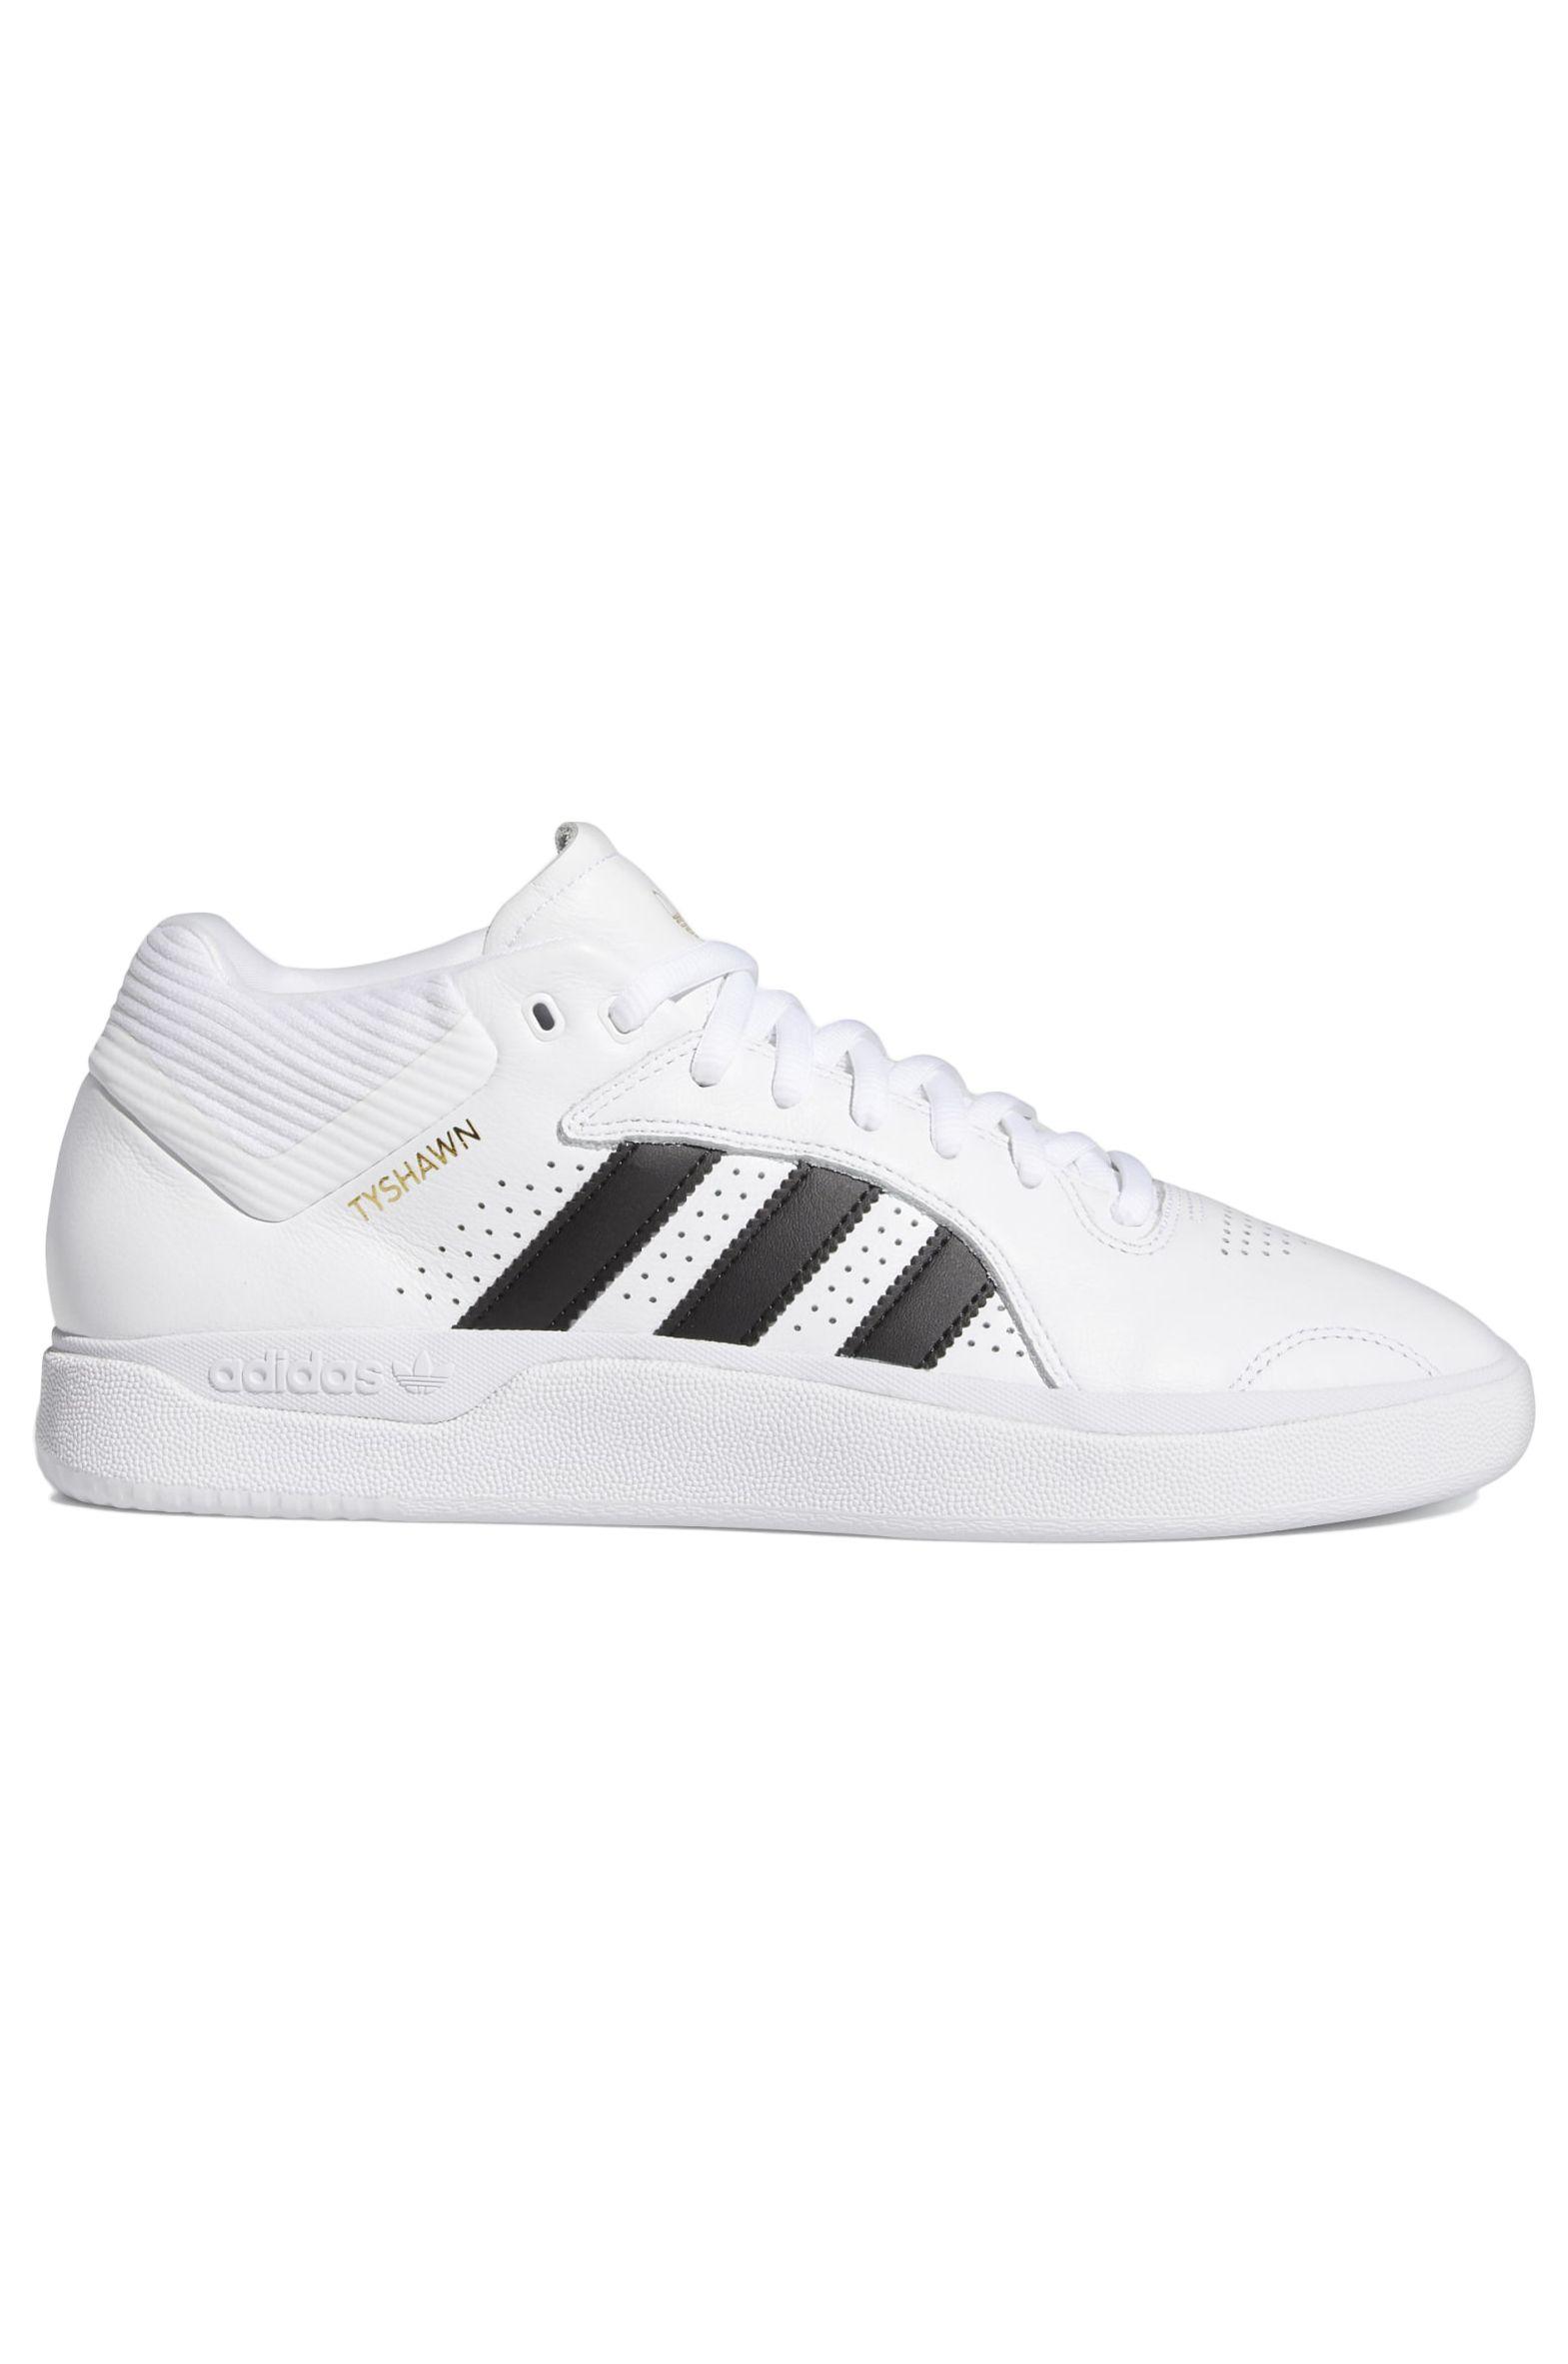 Adidas Shoes TYSHAWN Ftwr White/Core Black/Ftwr White